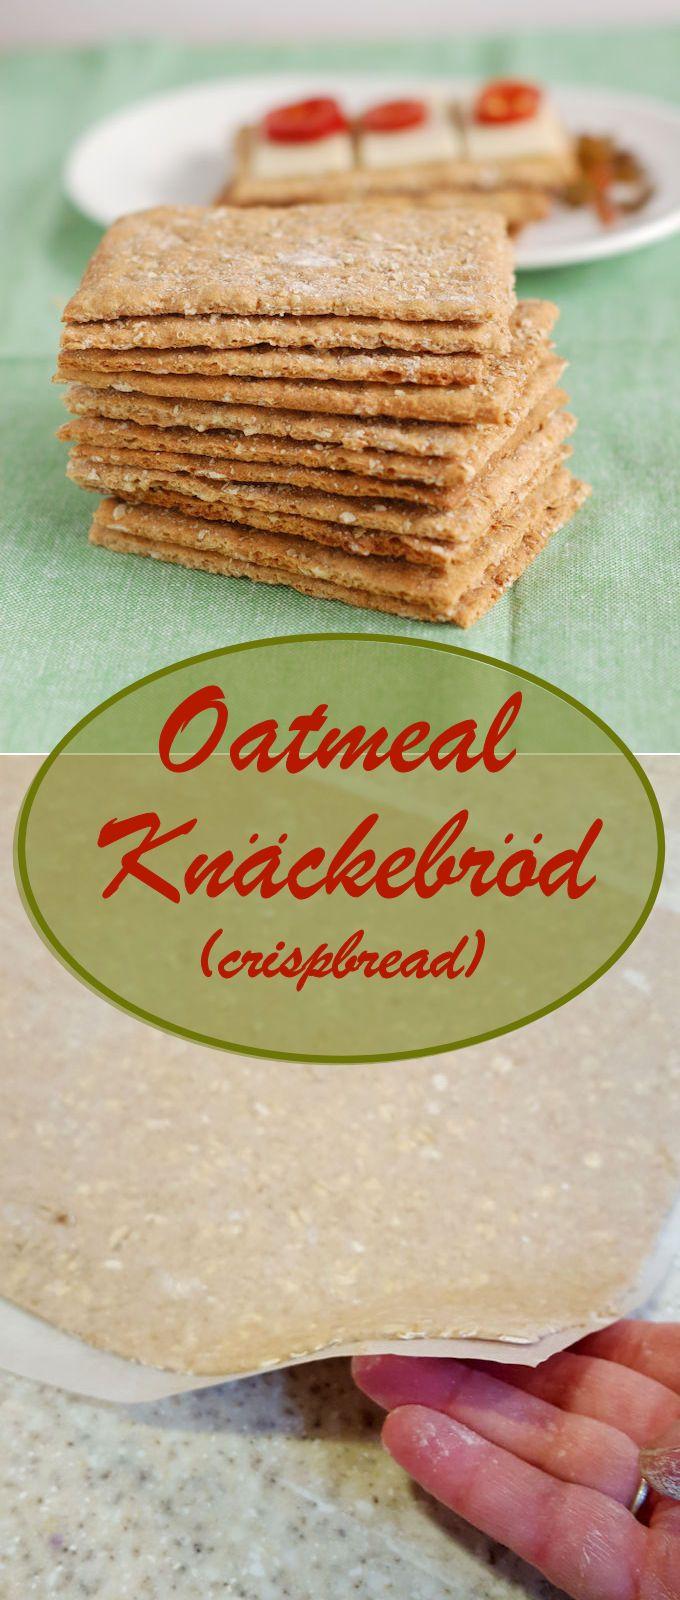 Homemade Oatmeal Knäckebröd (Crispbread) is unbelievably delicious, nutritious and surprisingly easy to make. #Breadbakers